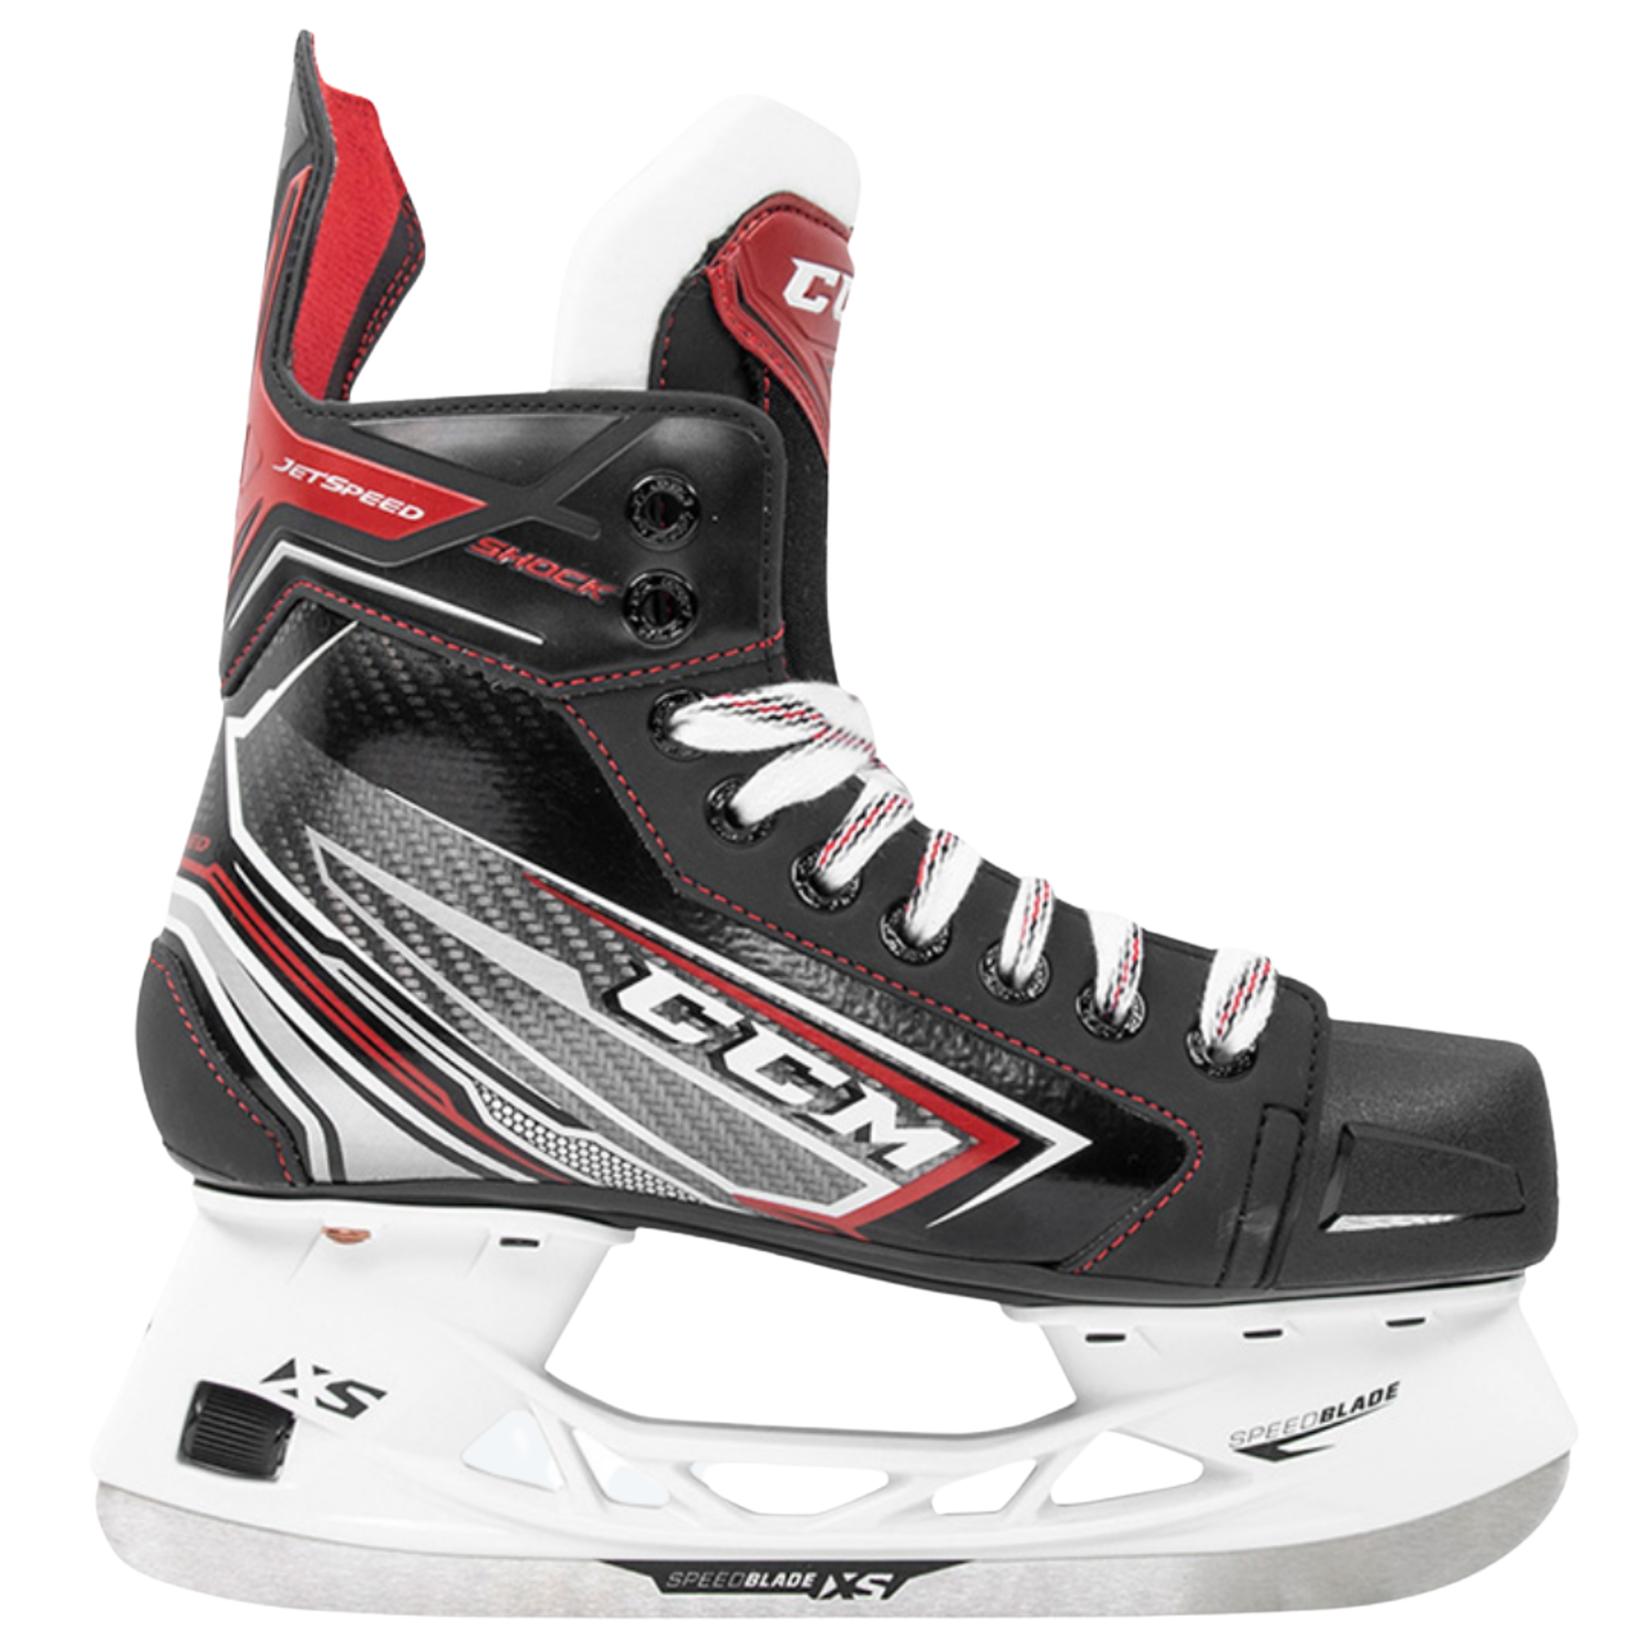 CCM Jetspeed  Shock Skate - SR